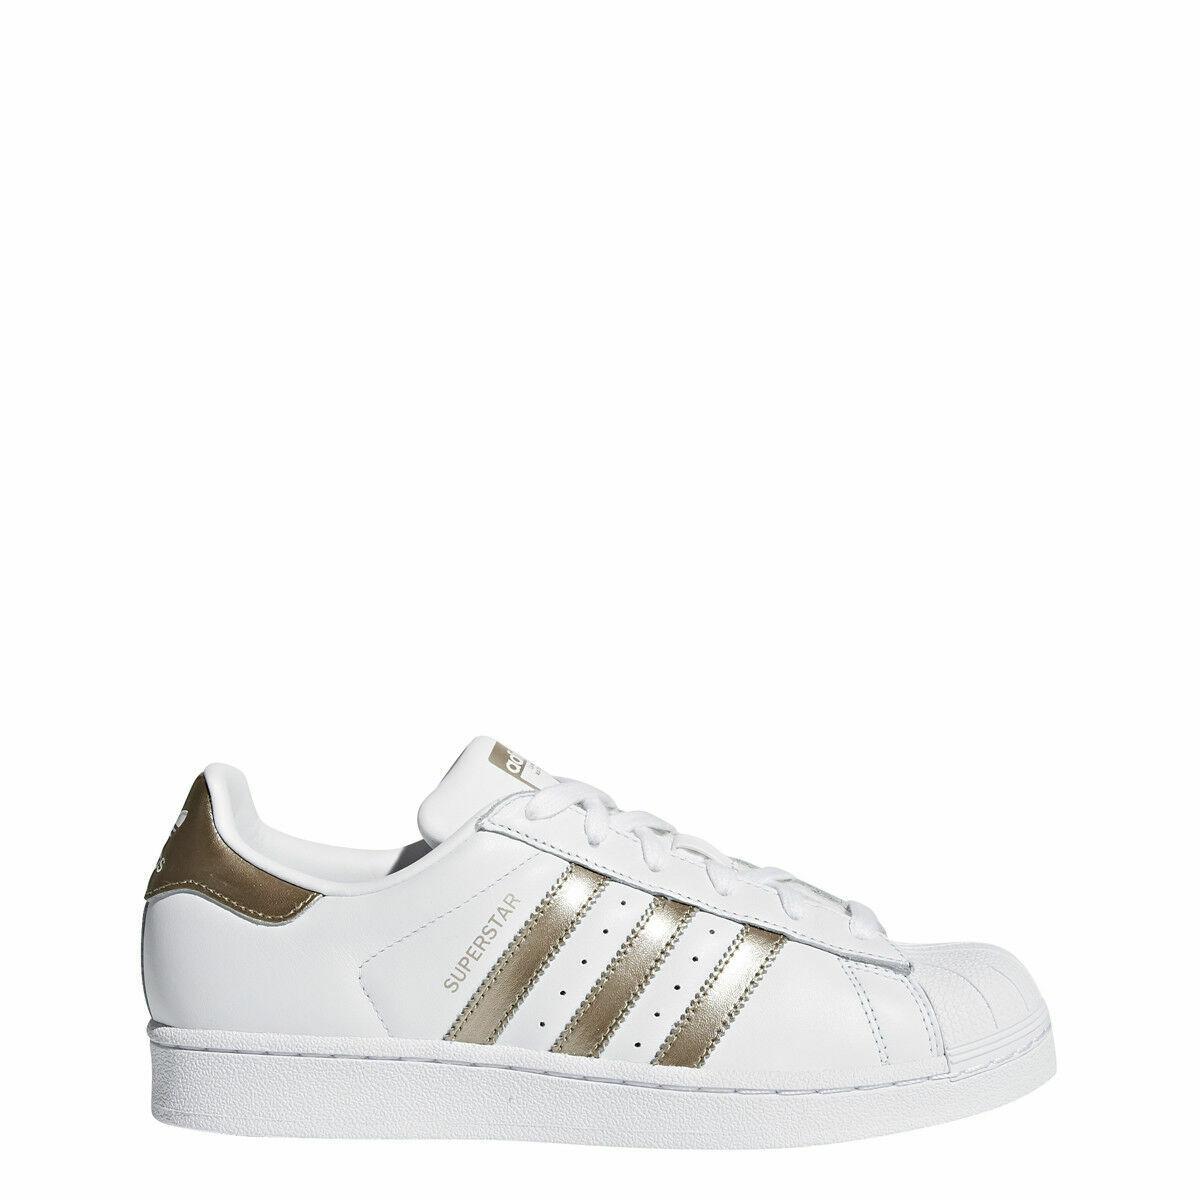 New Adidas Women's Originals Superstar Shoes (CG5463) White//Cyber Metallic